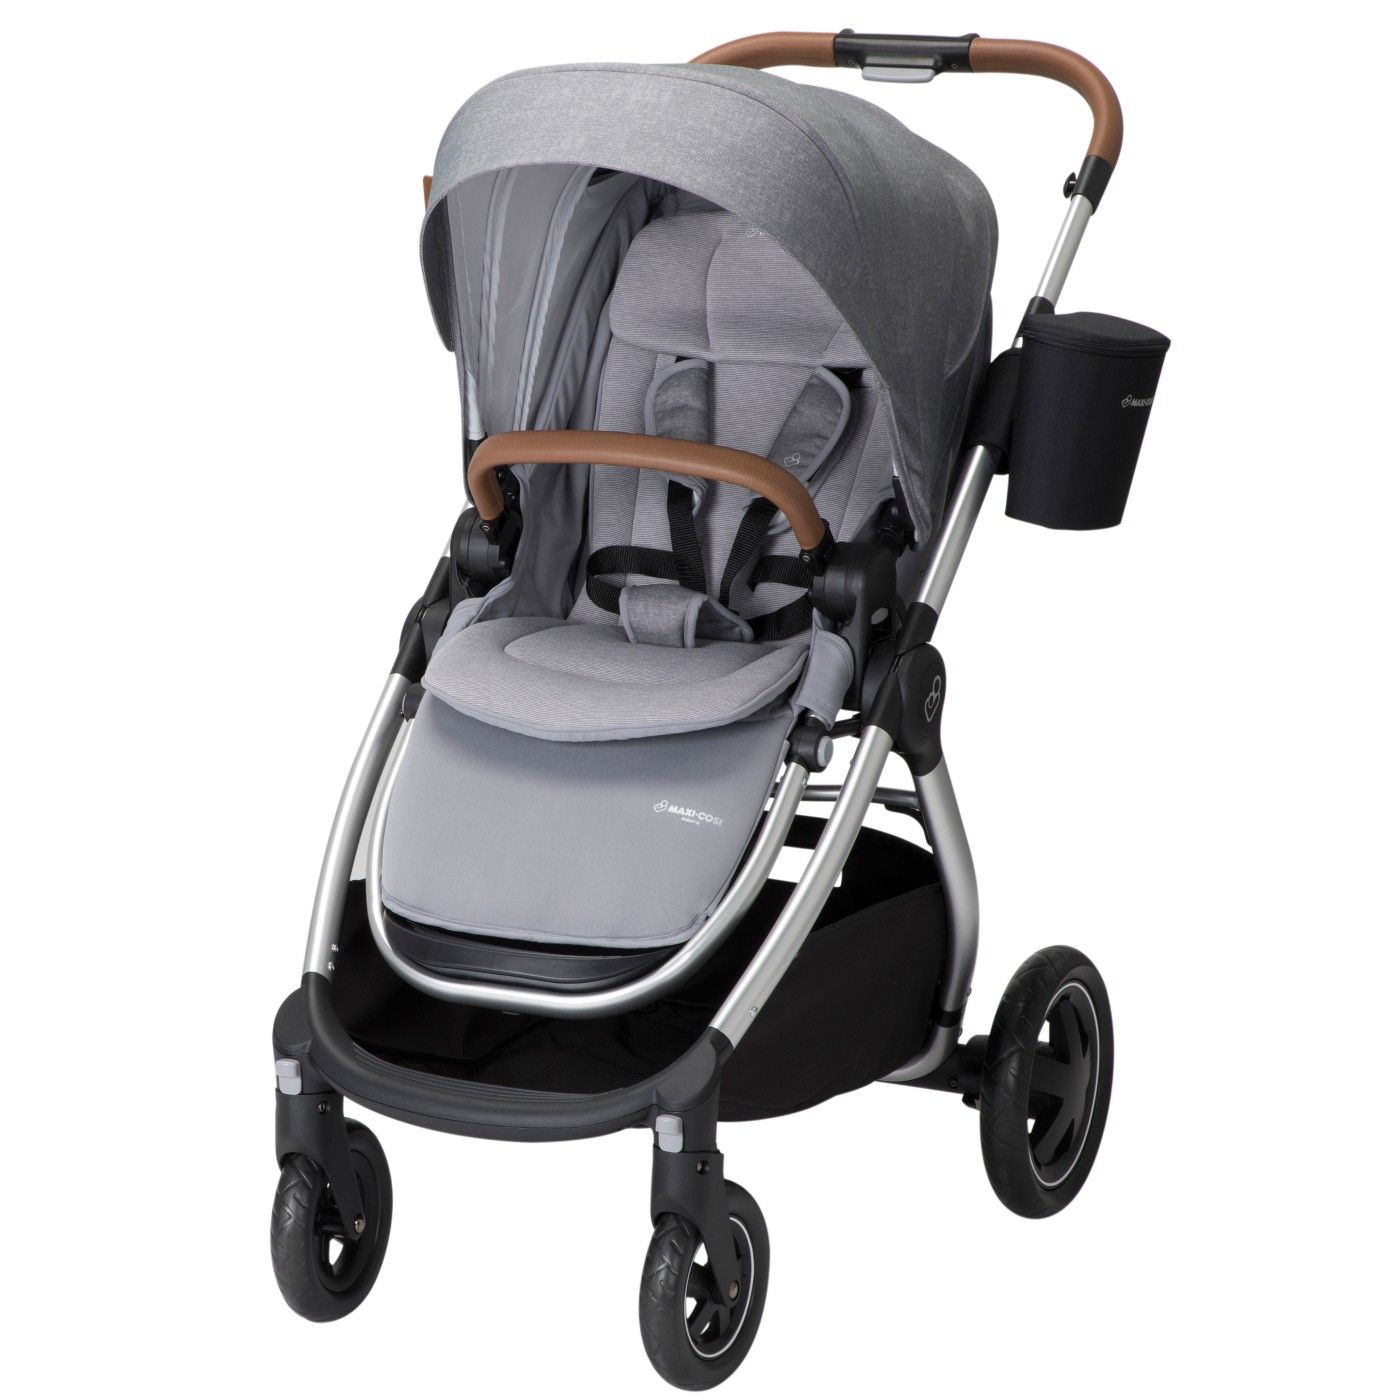 MaxiCosi Adorra Modular Stroller, Nomad Grey Target